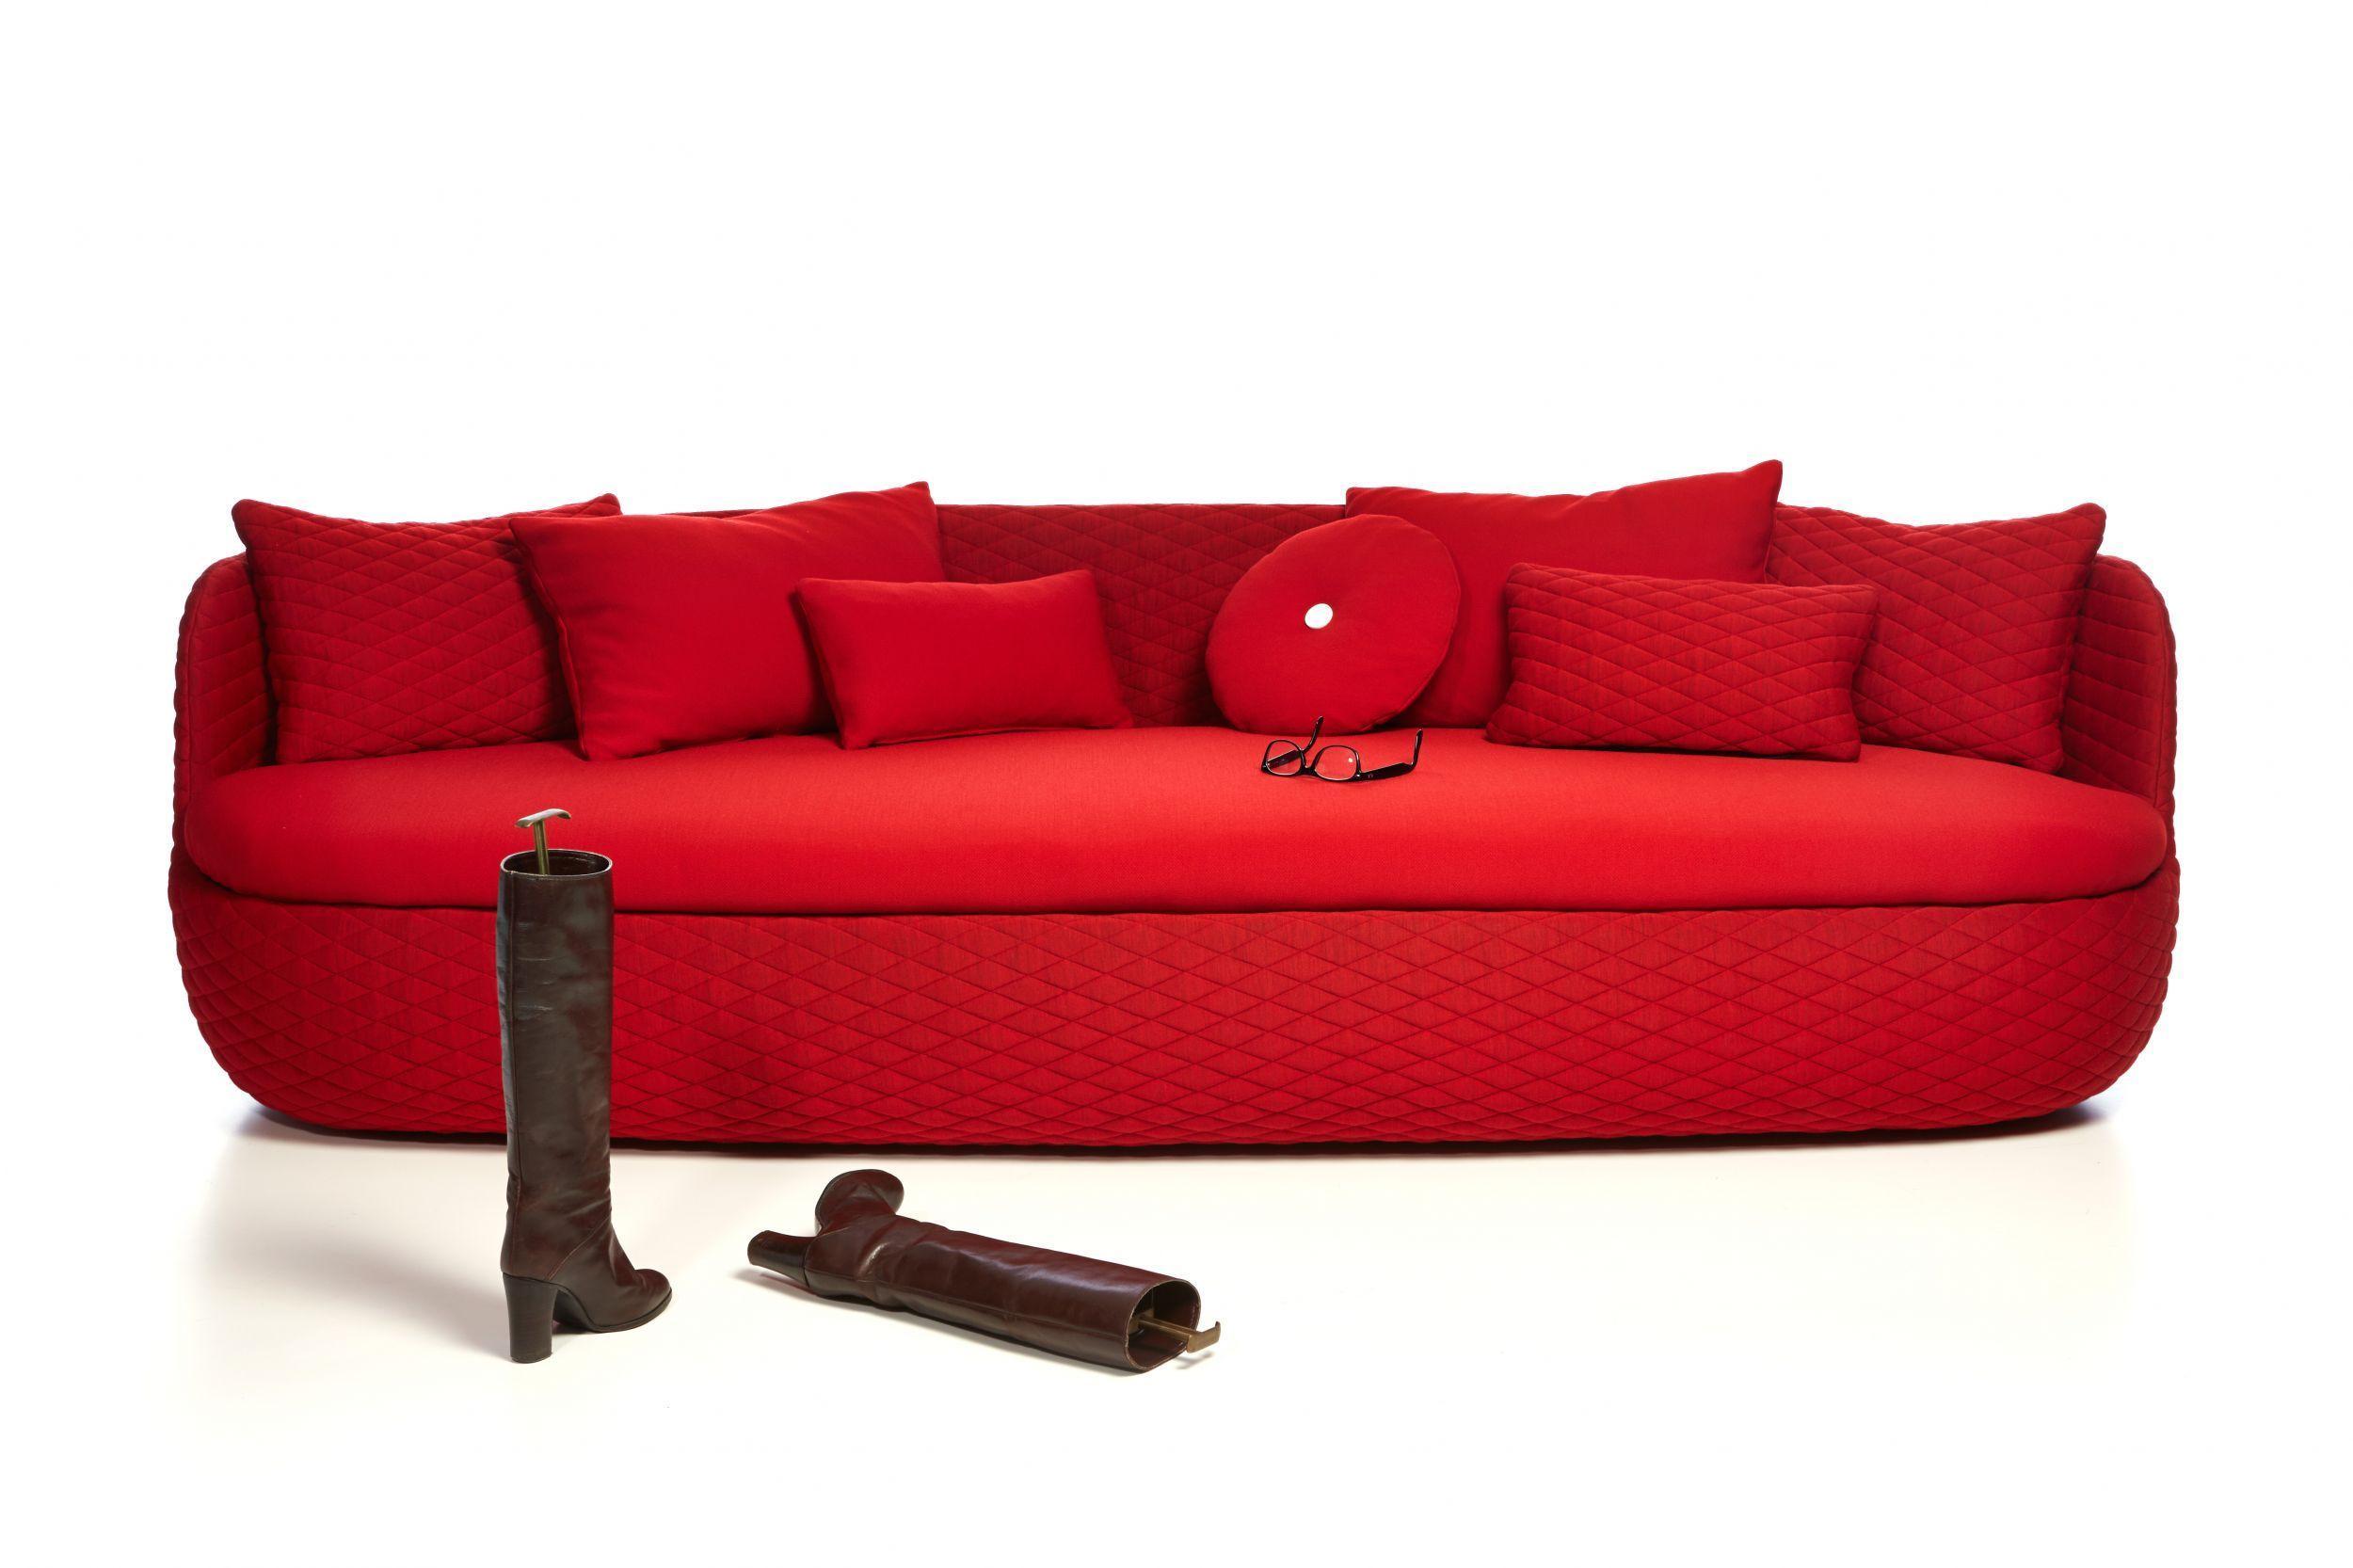 bart sofa armchair furniture seating pinterest. Black Bedroom Furniture Sets. Home Design Ideas